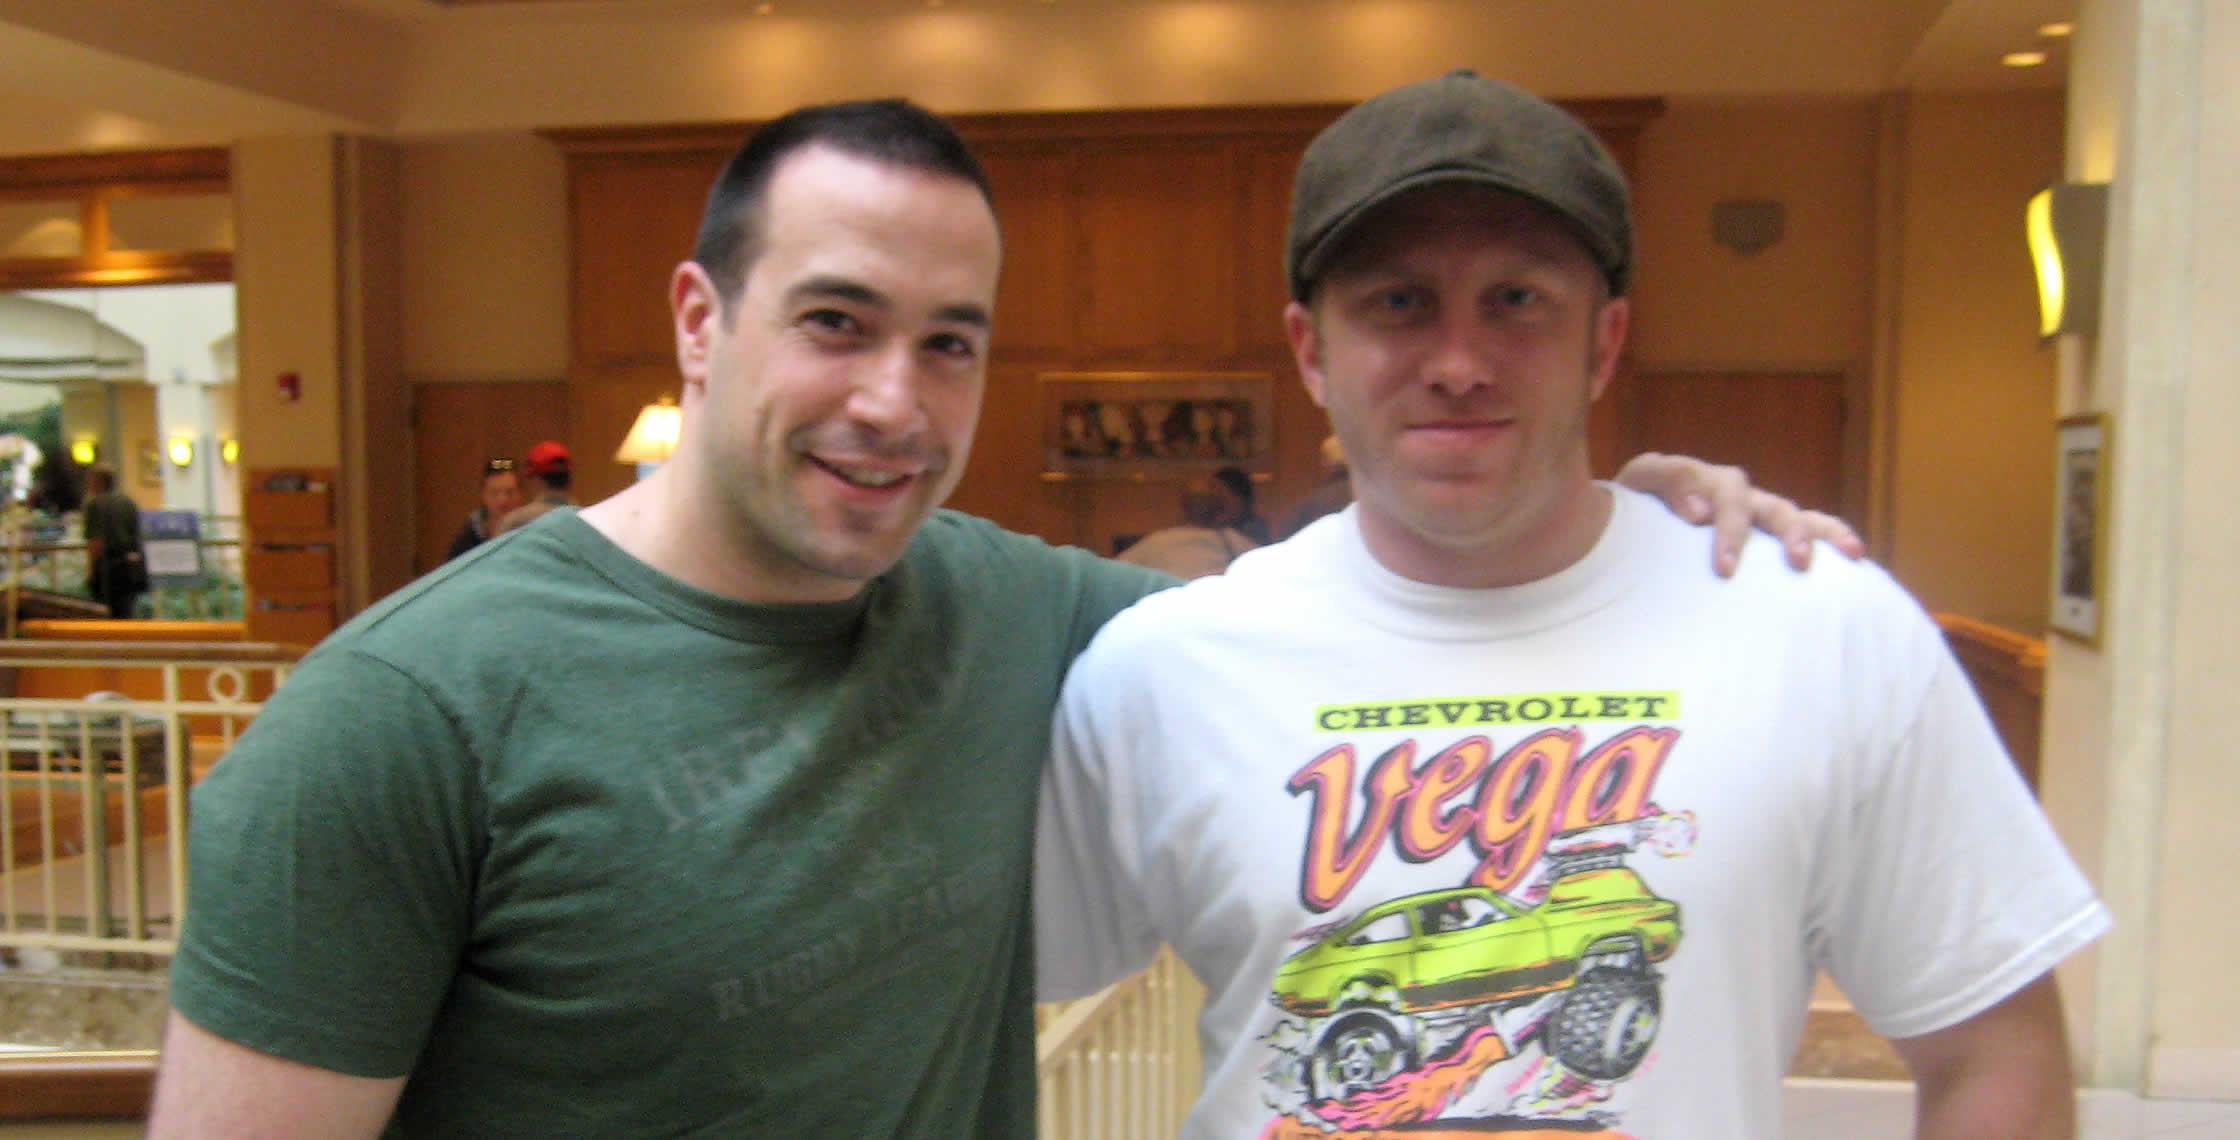 Ben Nadel at CFUNITED 2008 (Washington, D.C.) with: Dan Vega